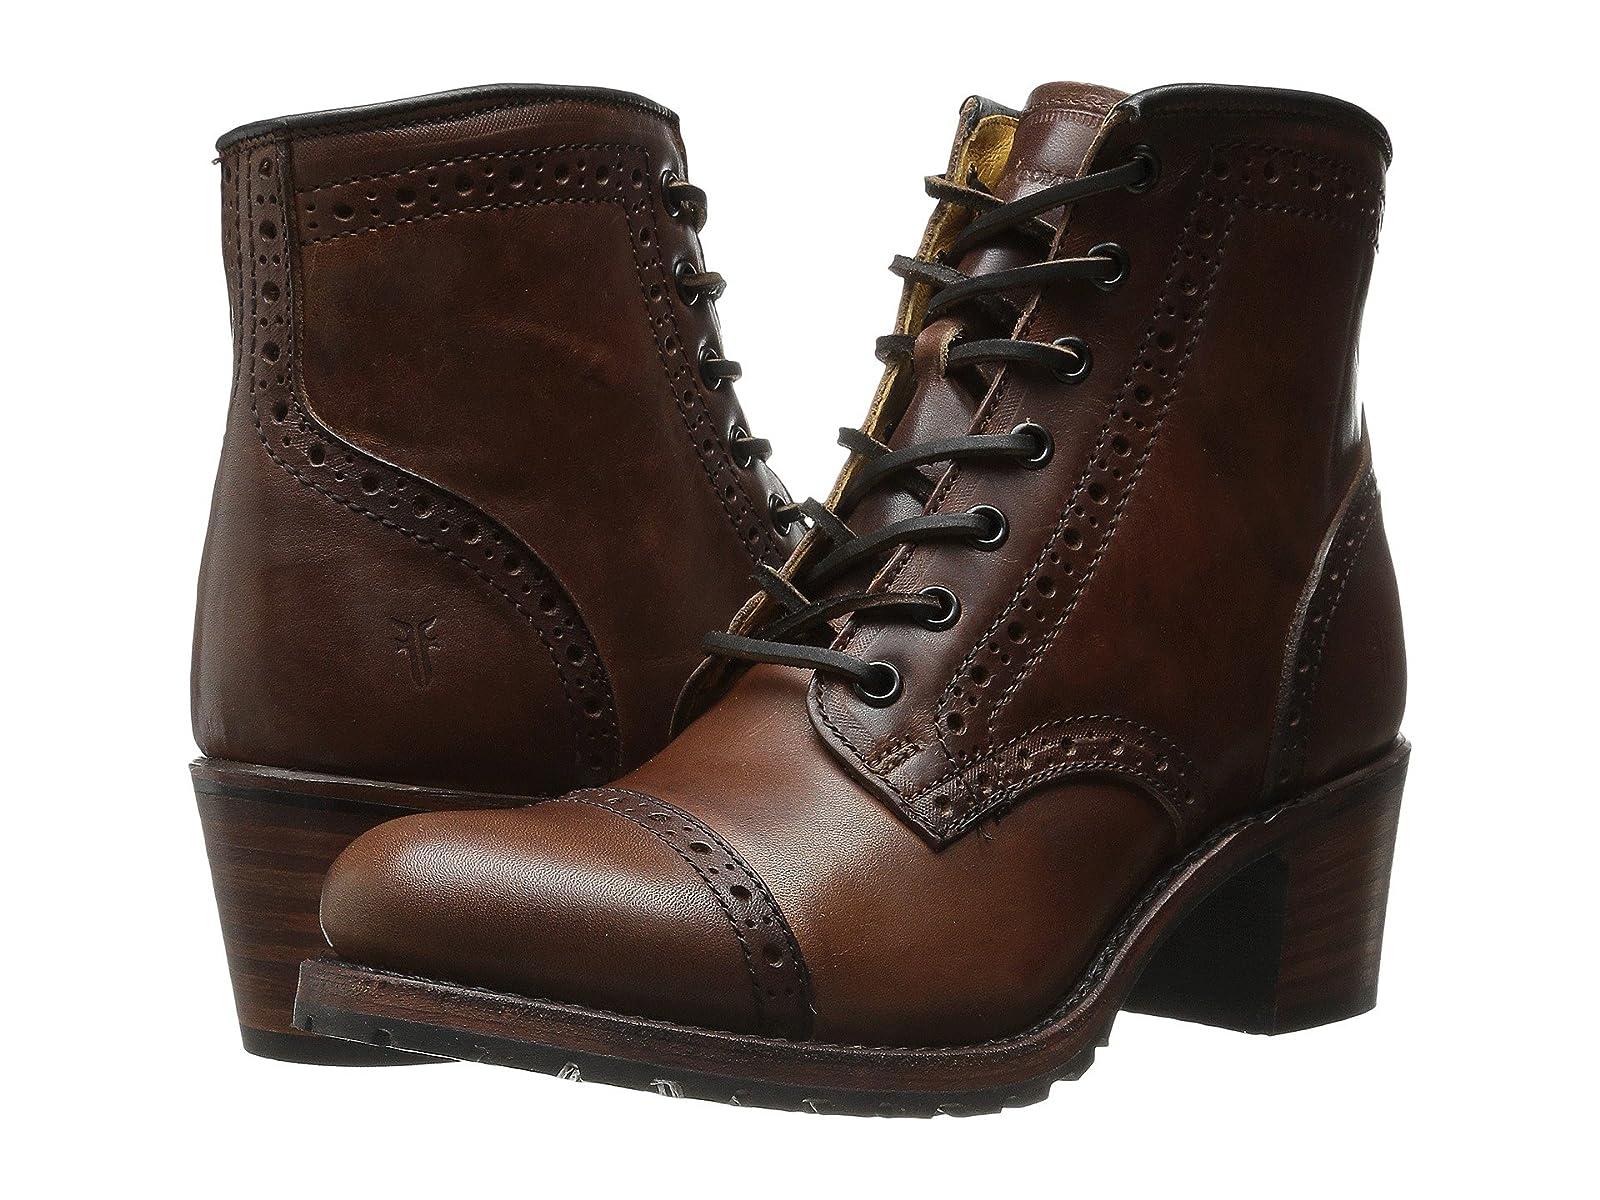 Frye Sabrina BrogueAffordable and distinctive shoes